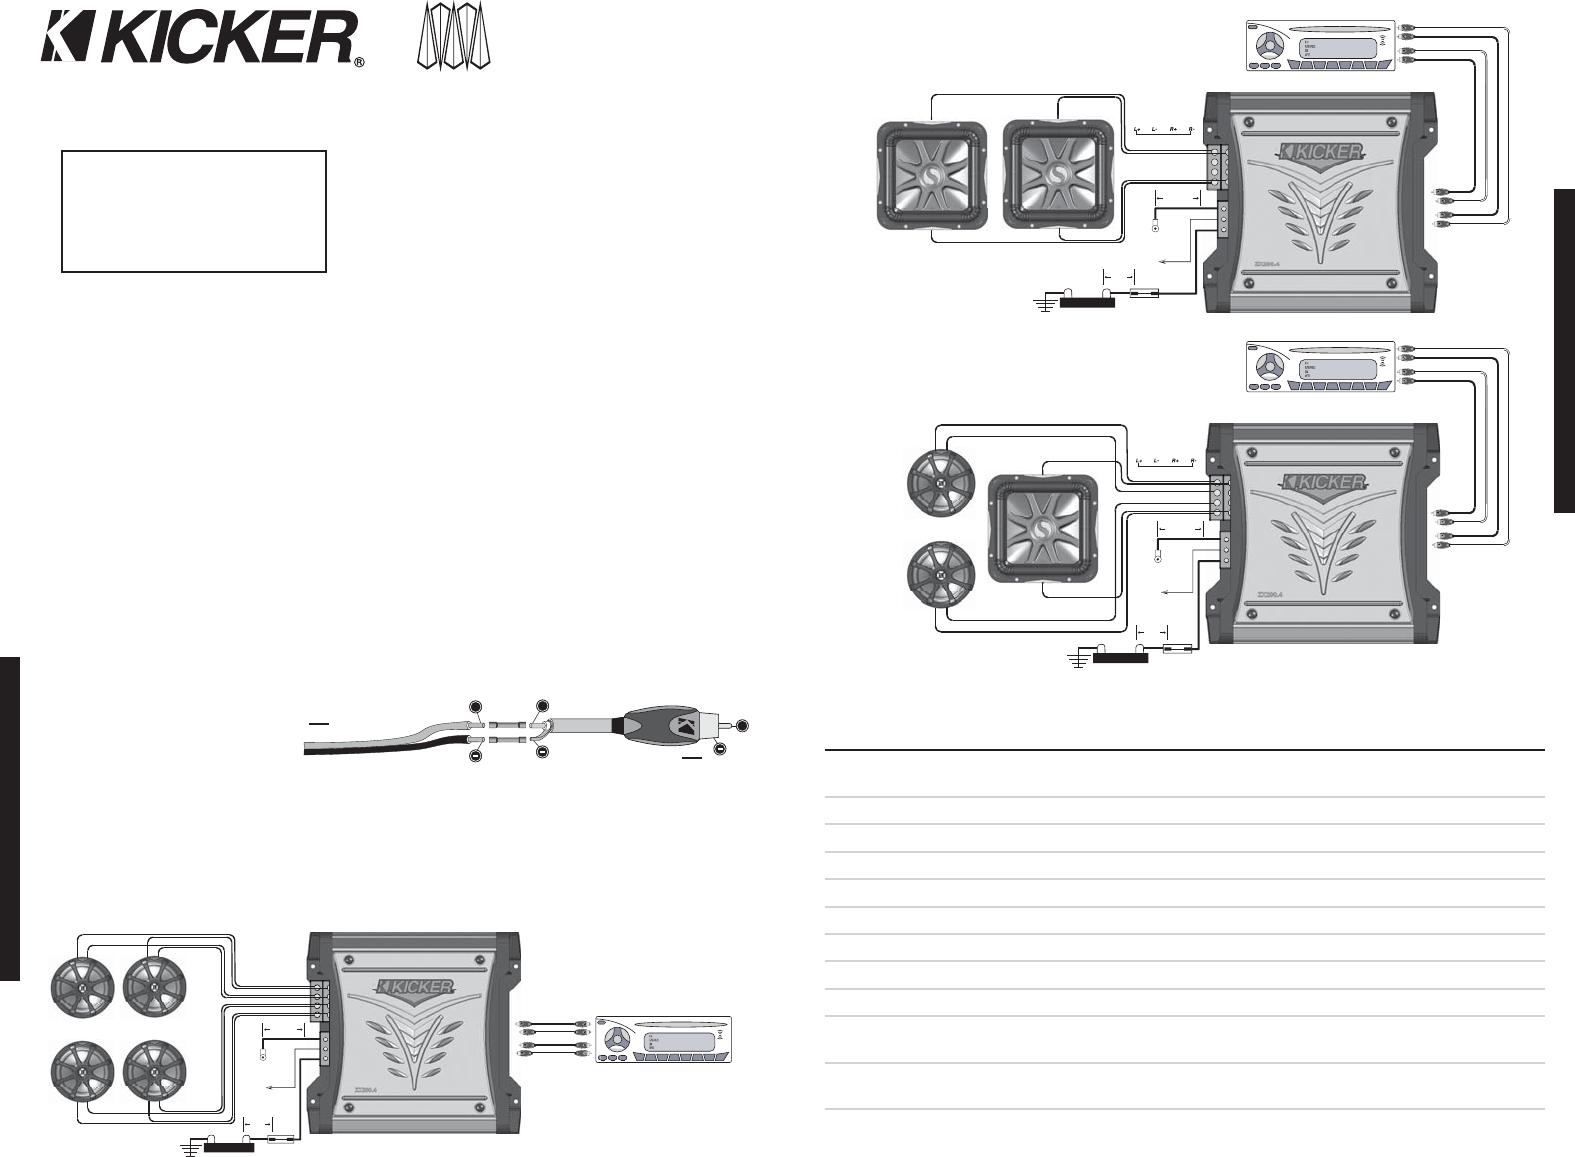 Single Kicker Wiring Diagram